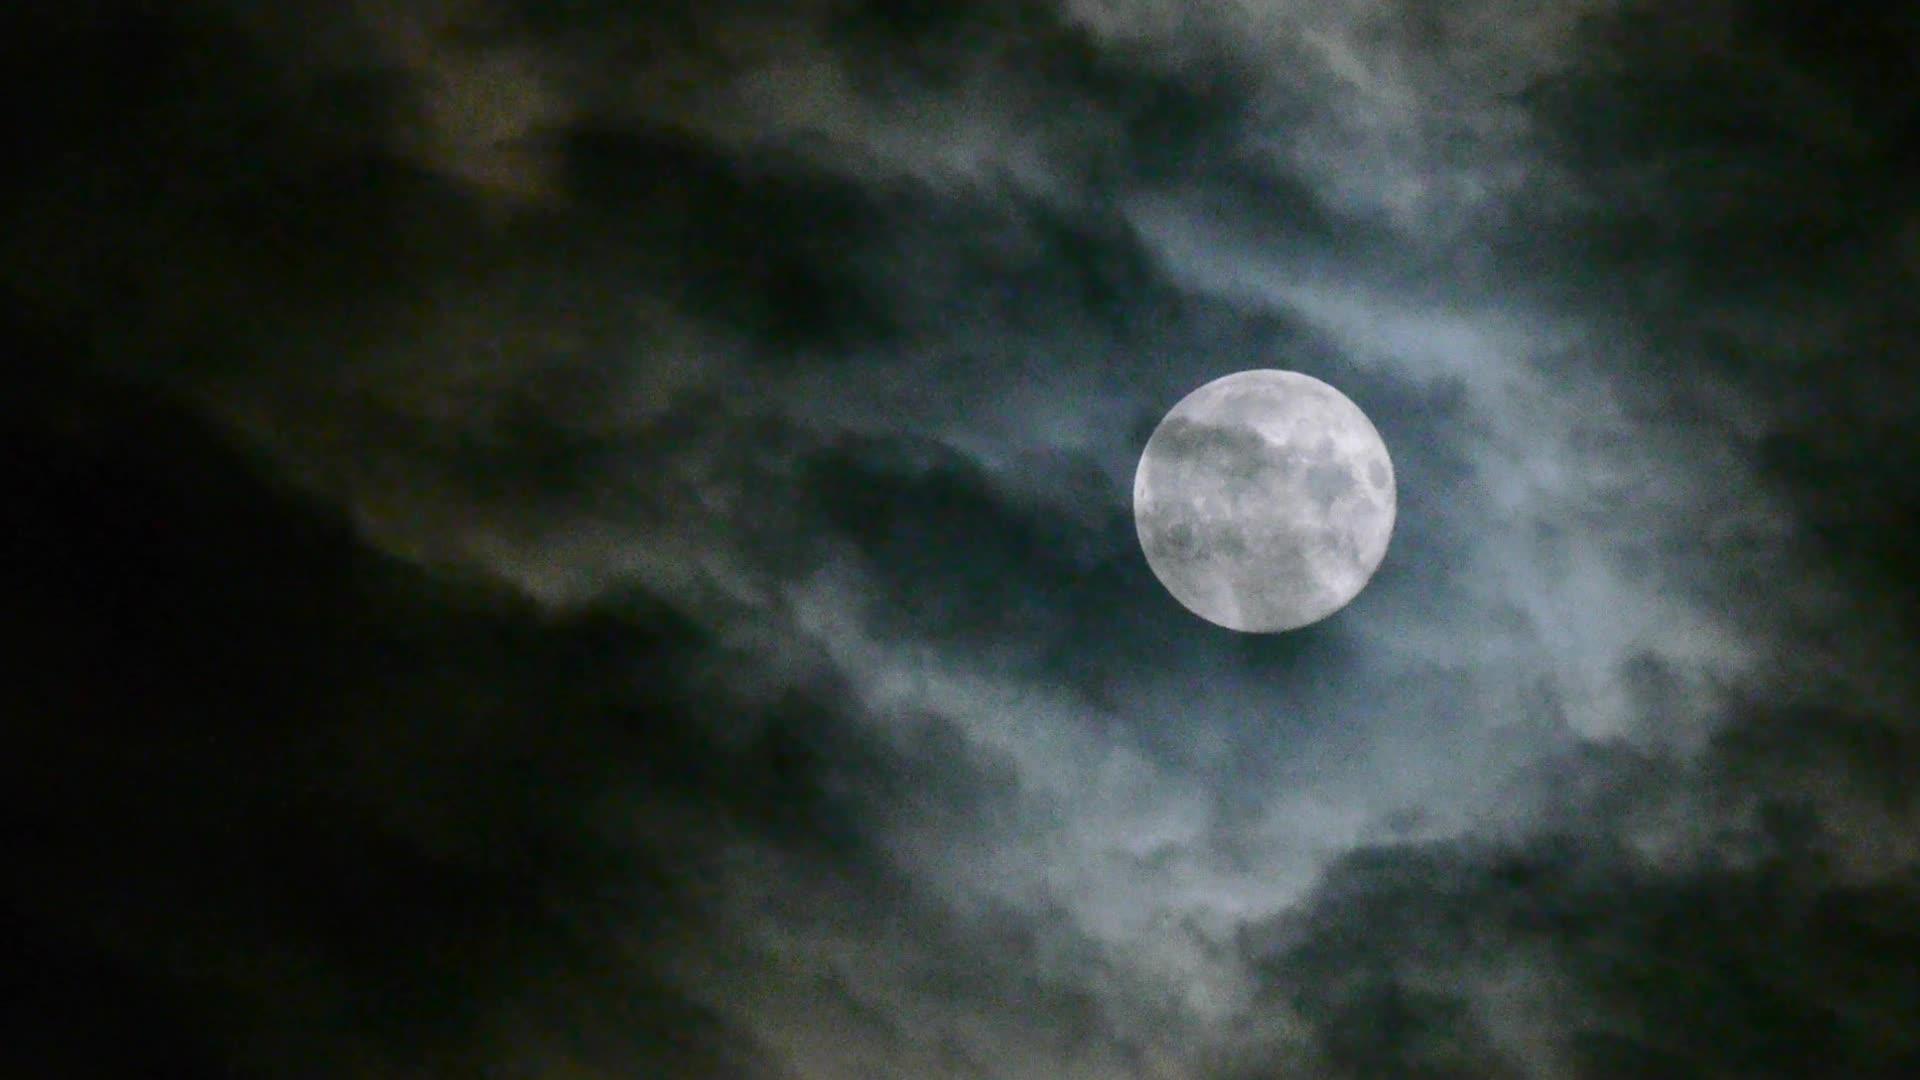 moon hd wallpapers 1080p